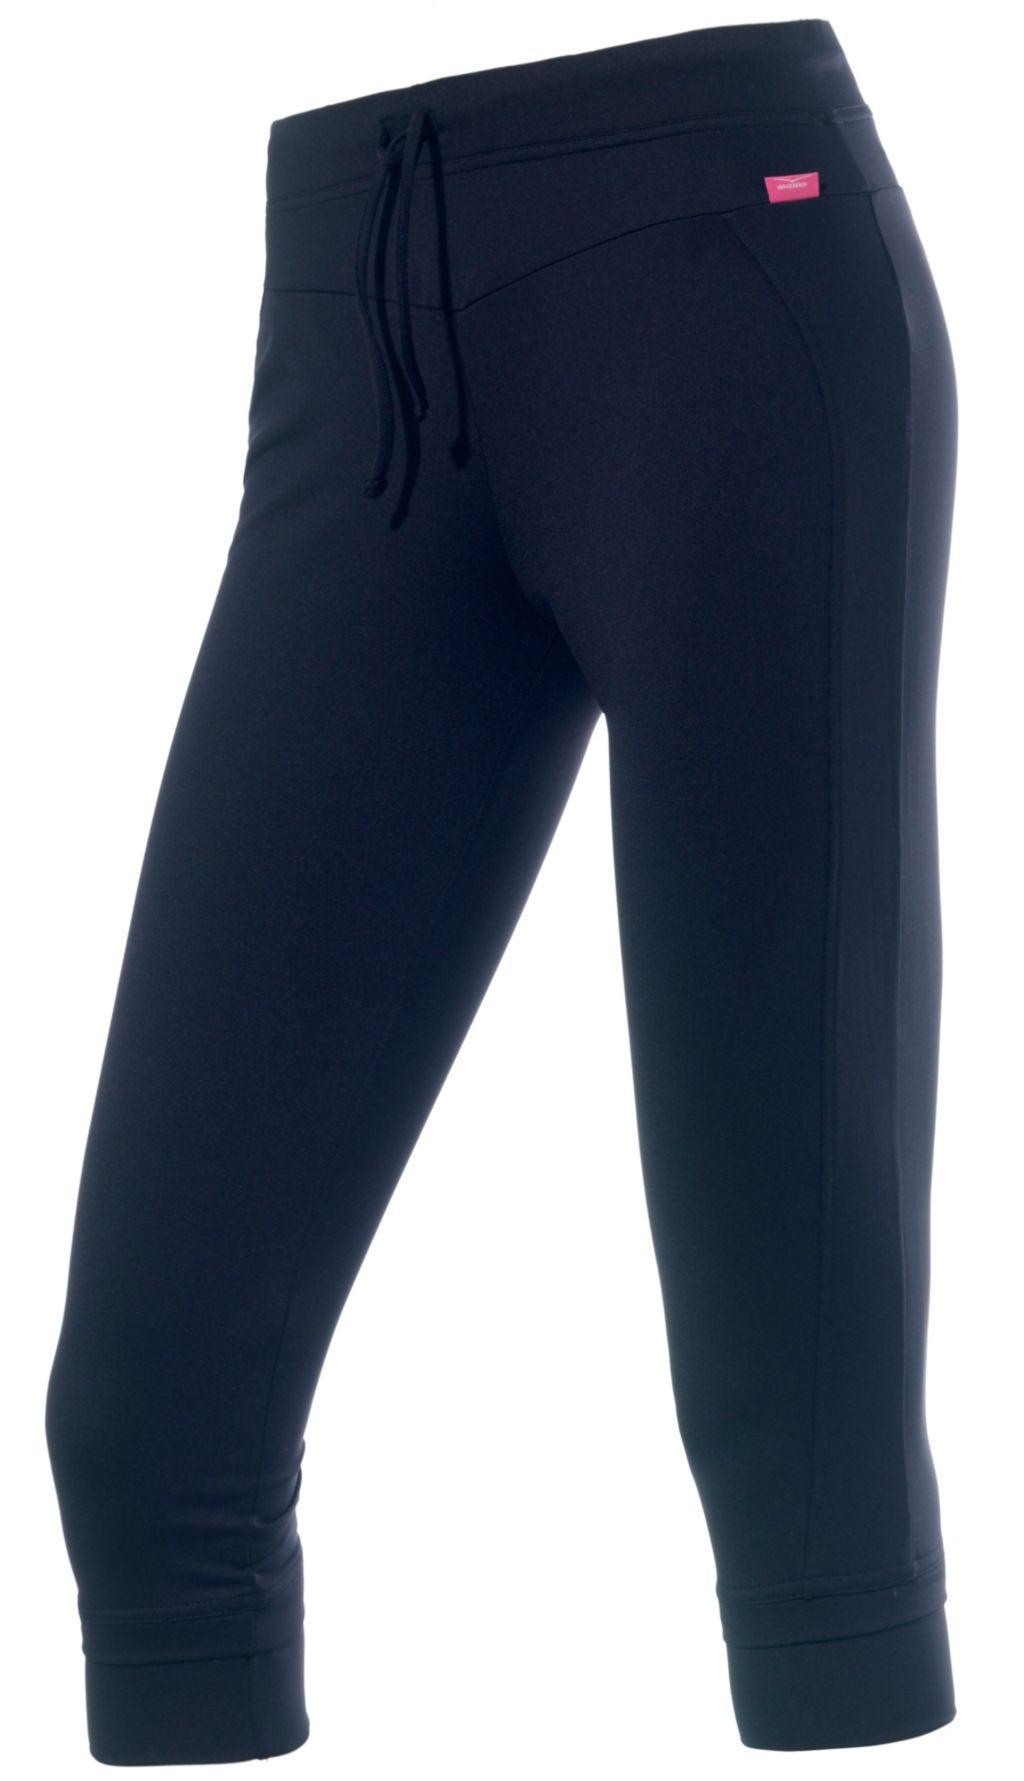 Dynas Yogapants Damen in schwarz, Größe XS